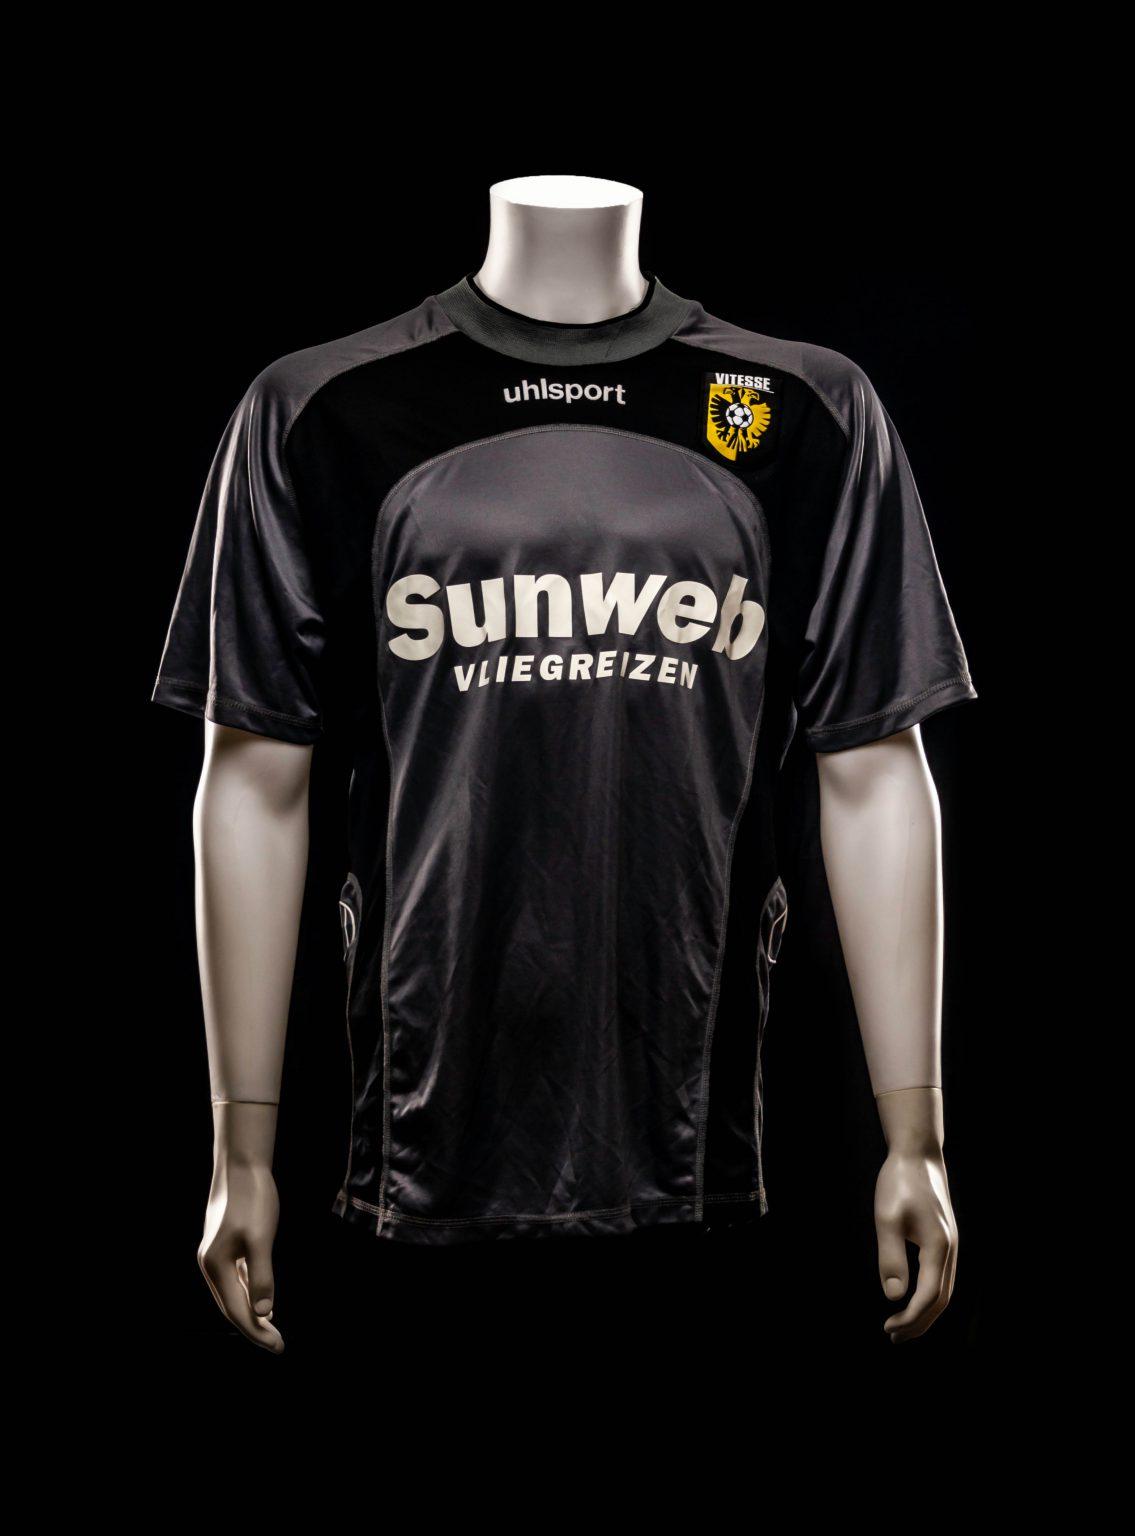 #24 Michael Jansen 2003-2004